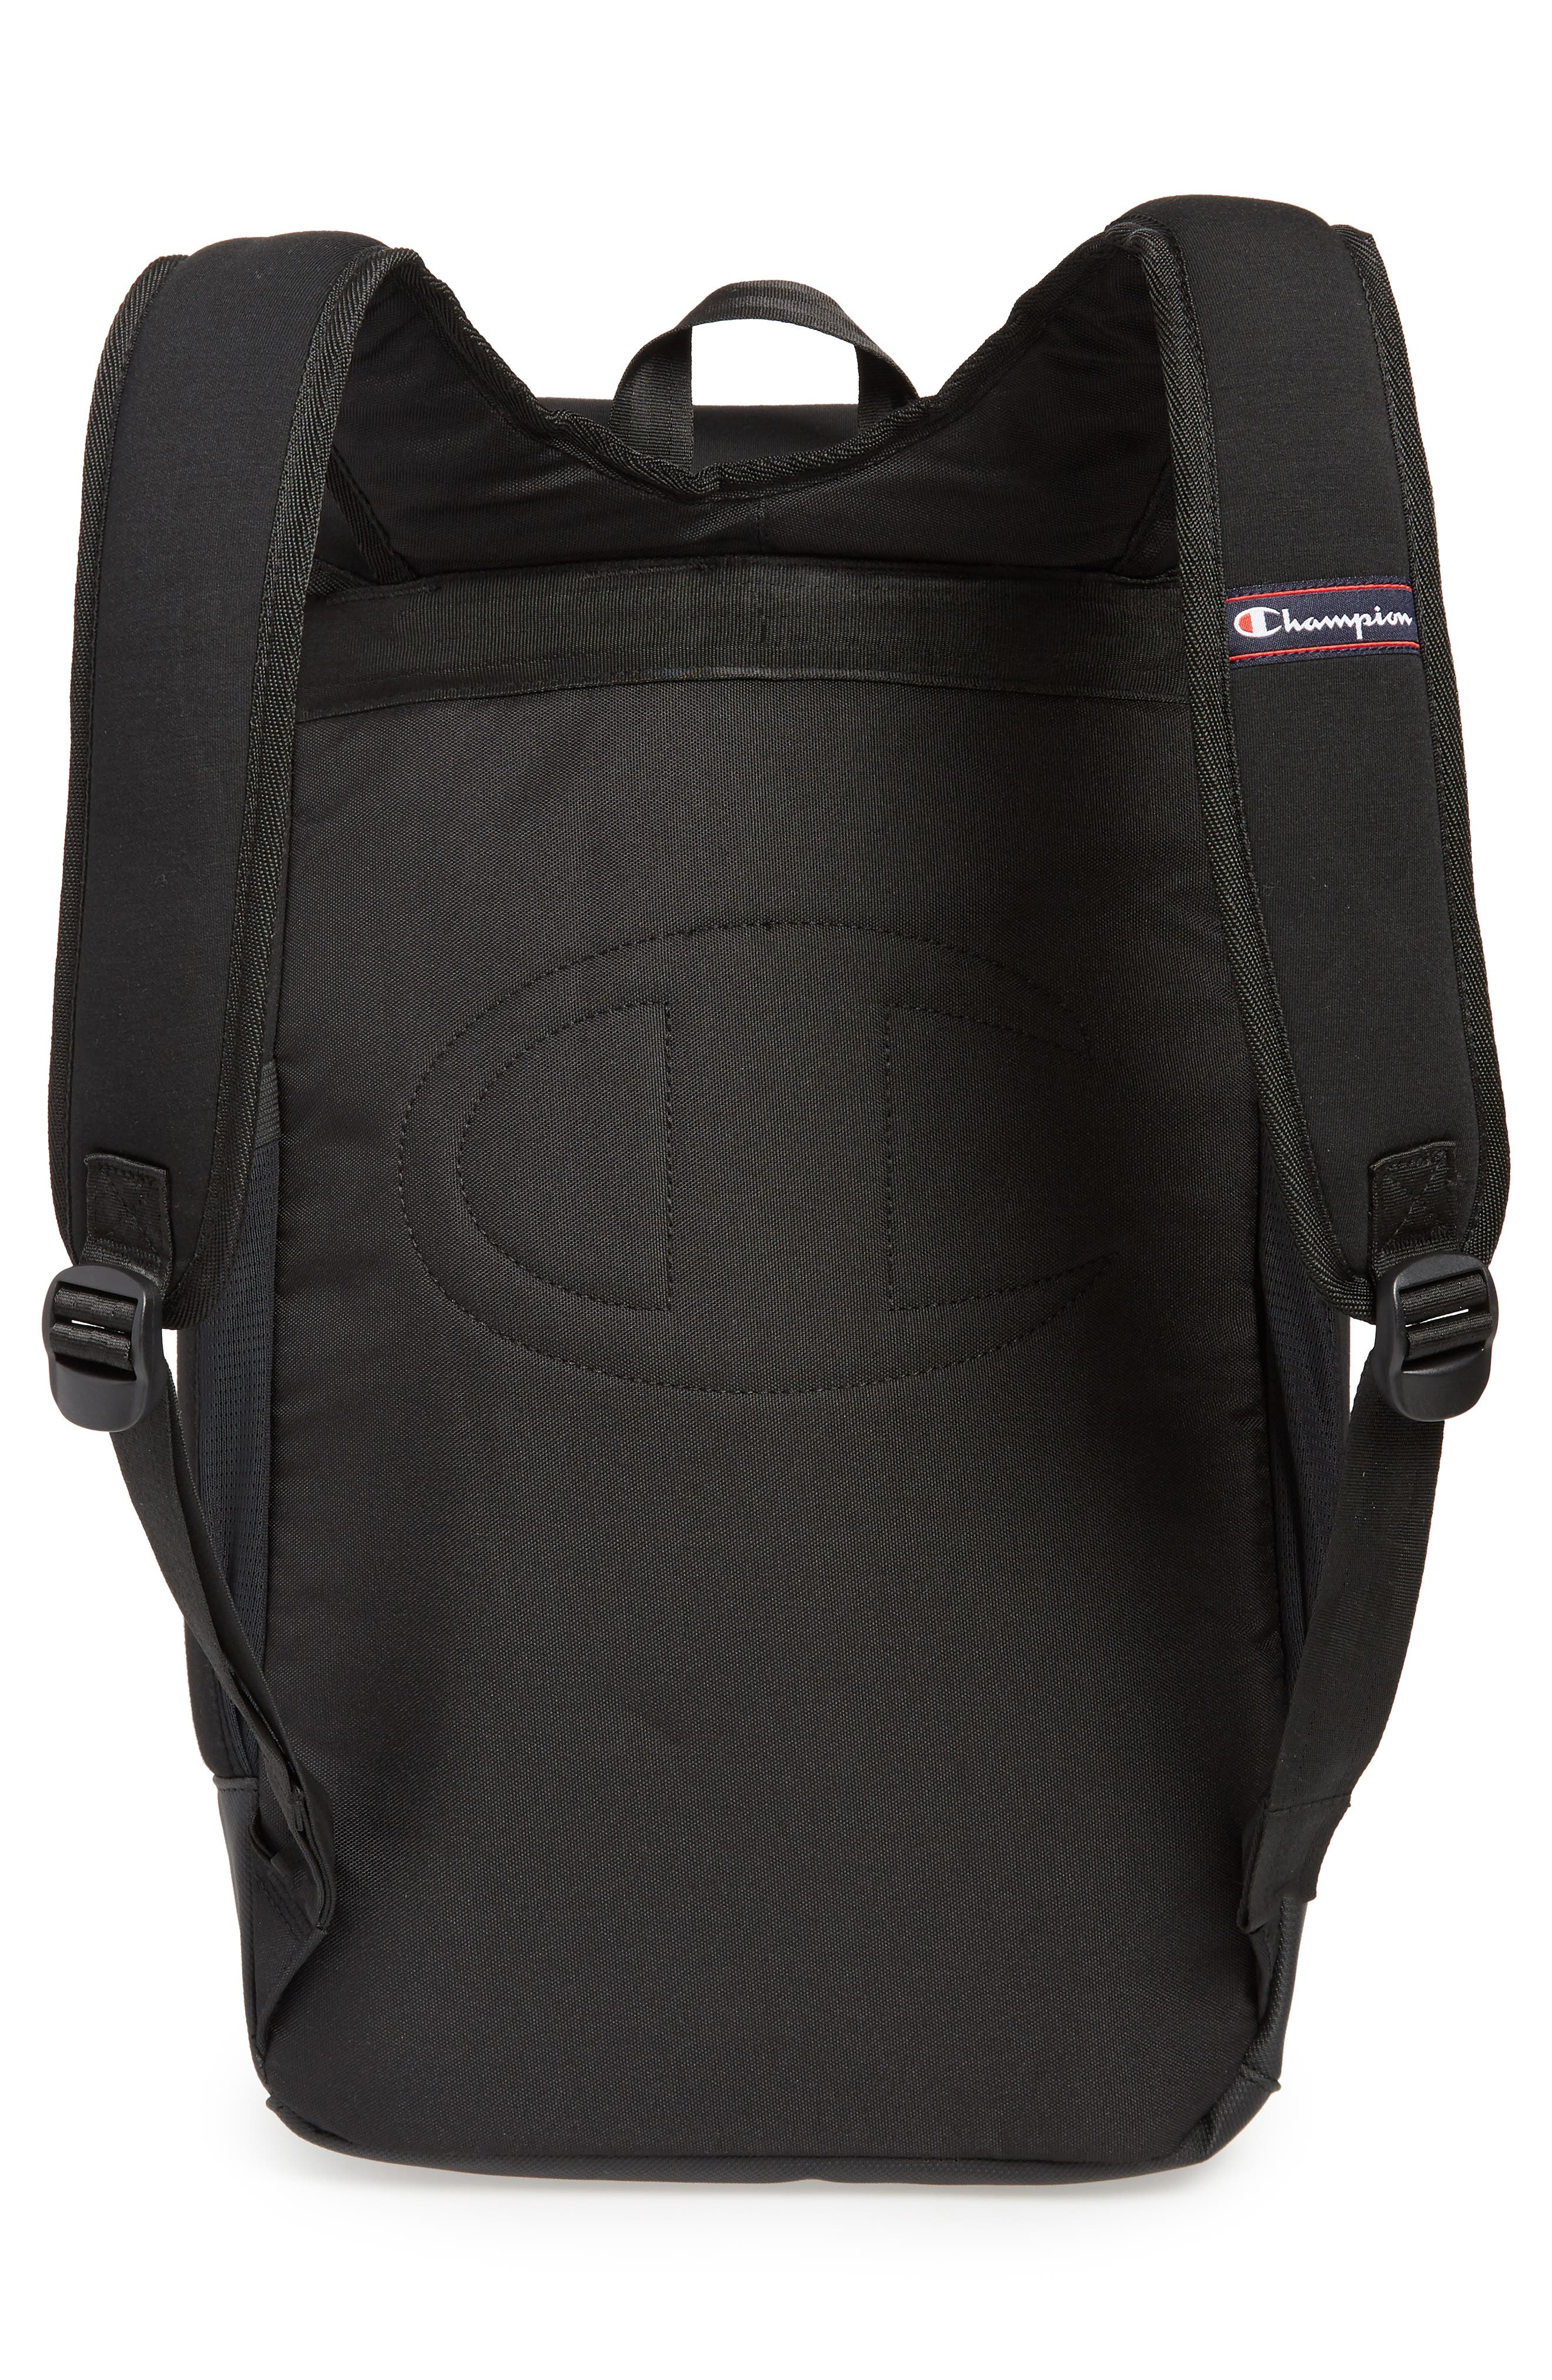 Top Load Backpack,                             Alternate thumbnail 3, color,                             BLACK